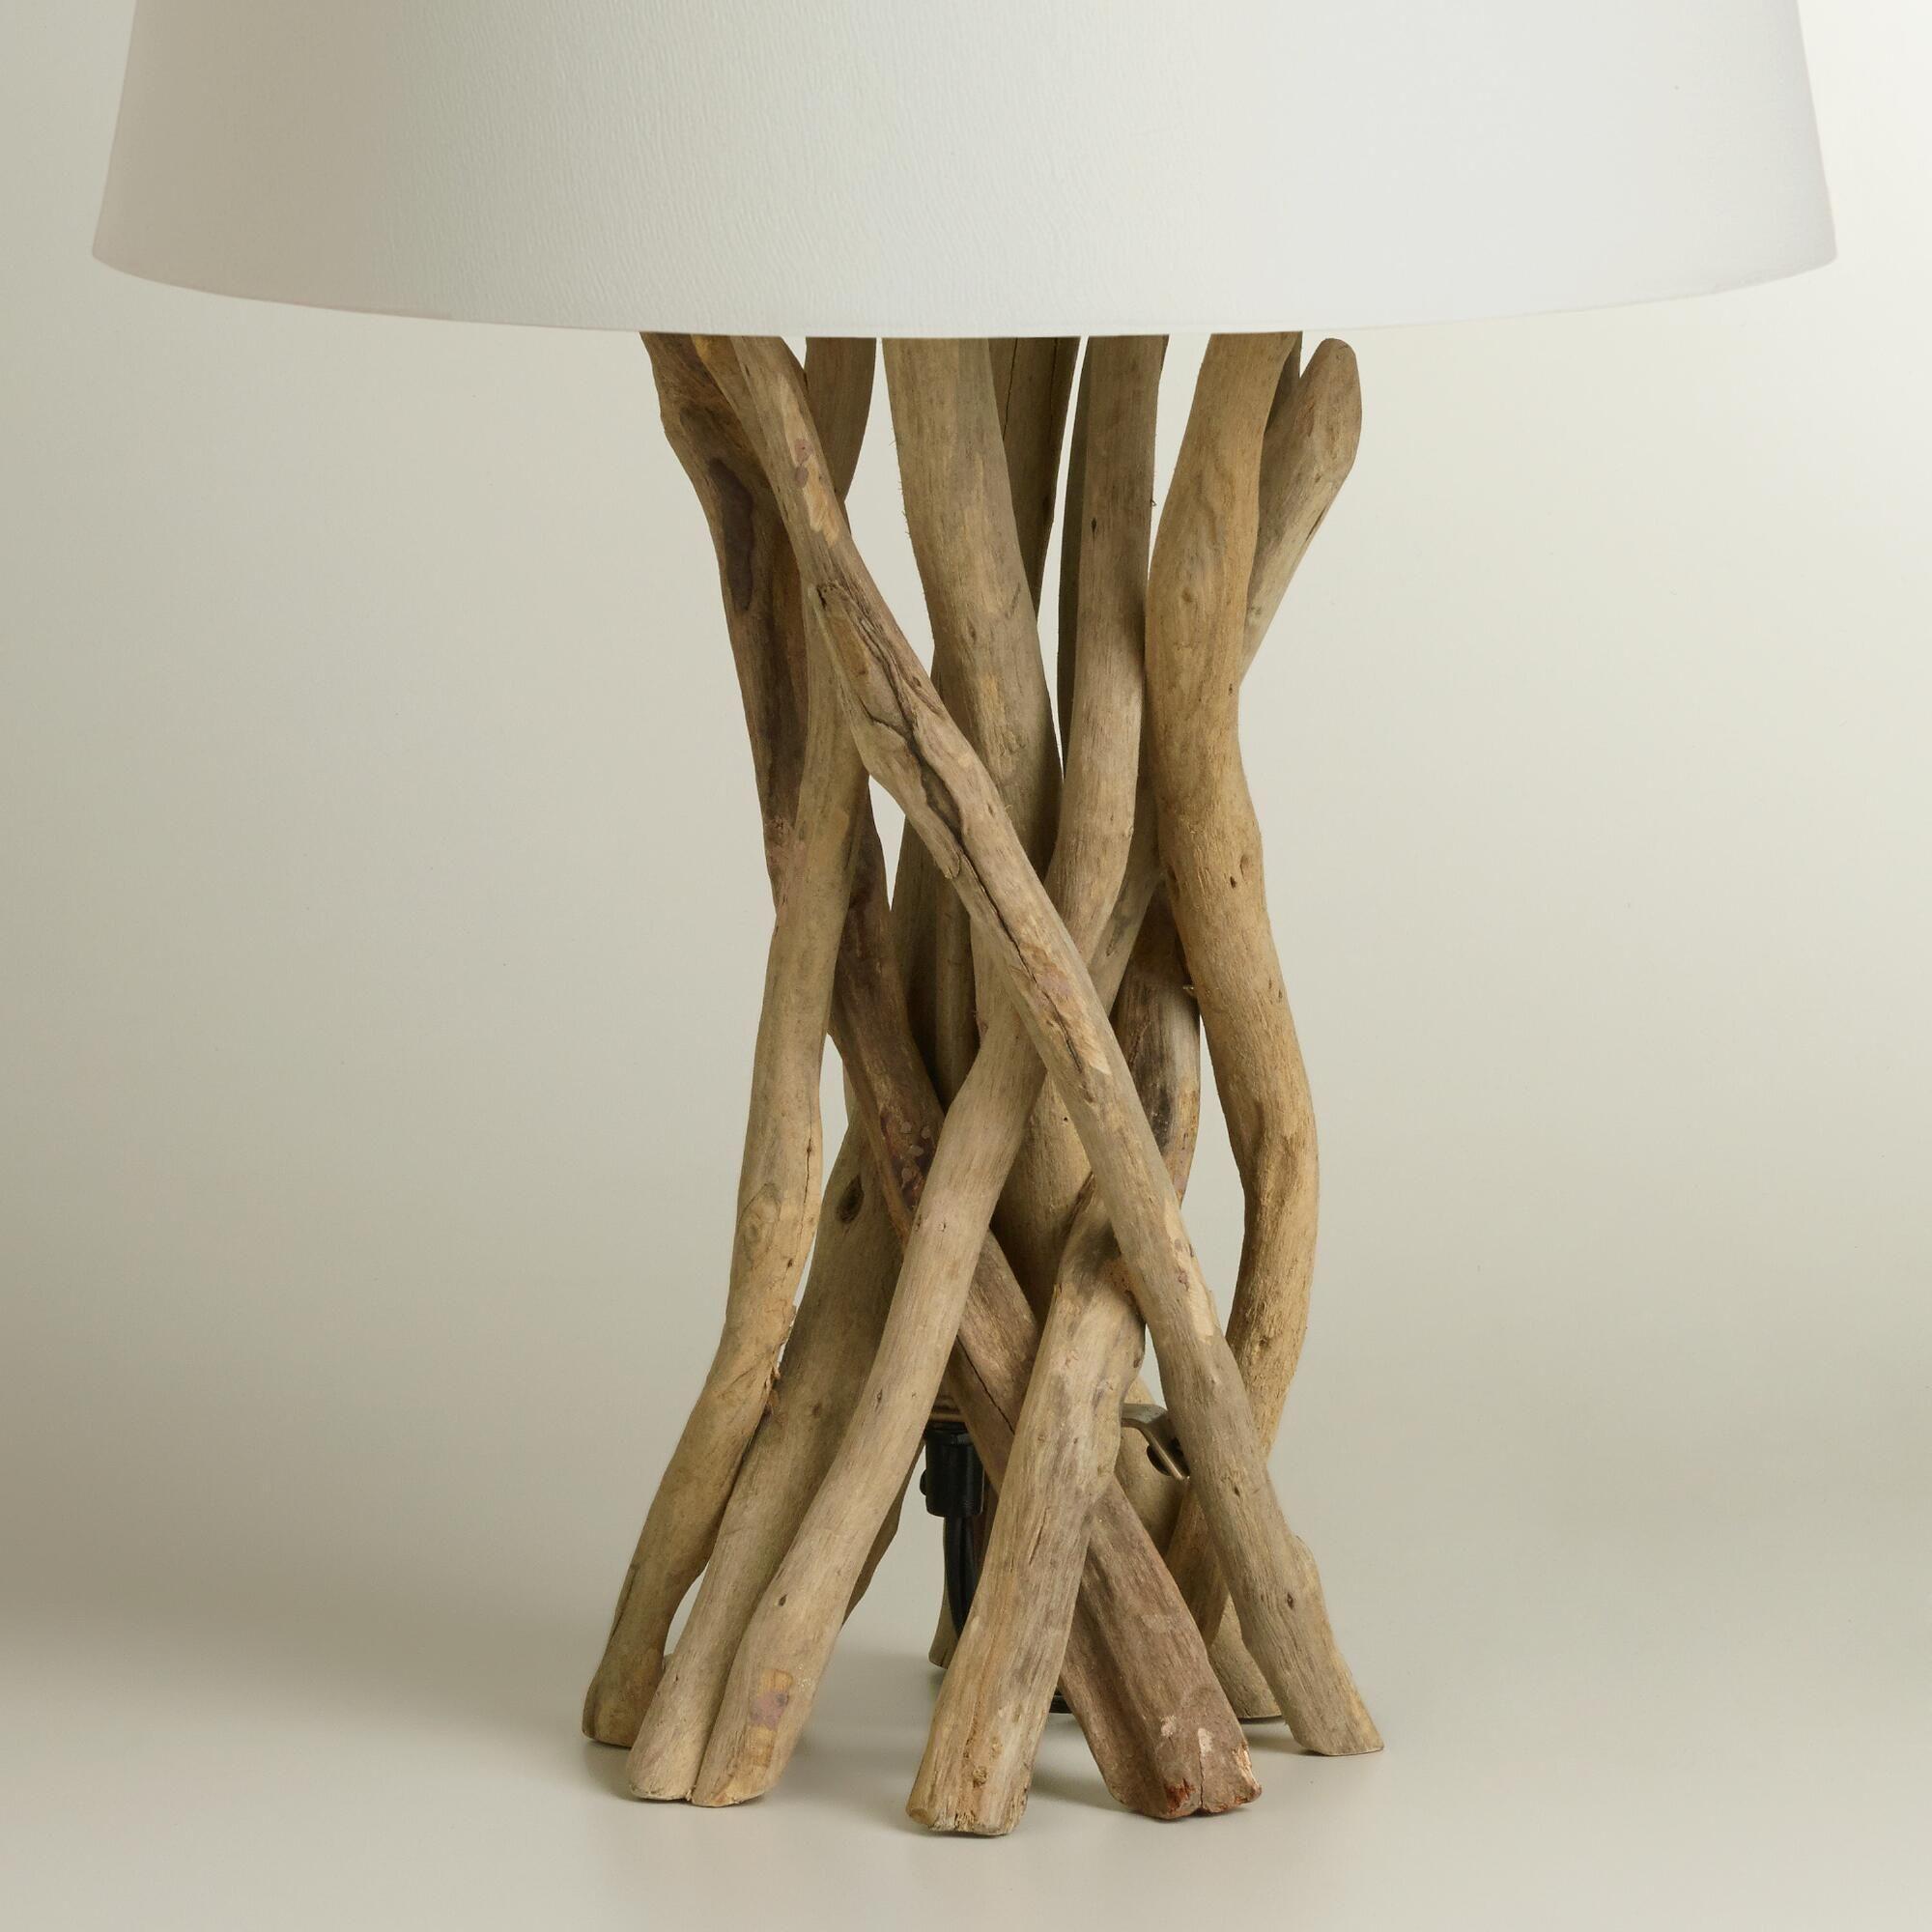 Driftwood Table Lamp Base Table Lamp Base Driftwood Lamp Table Lamp